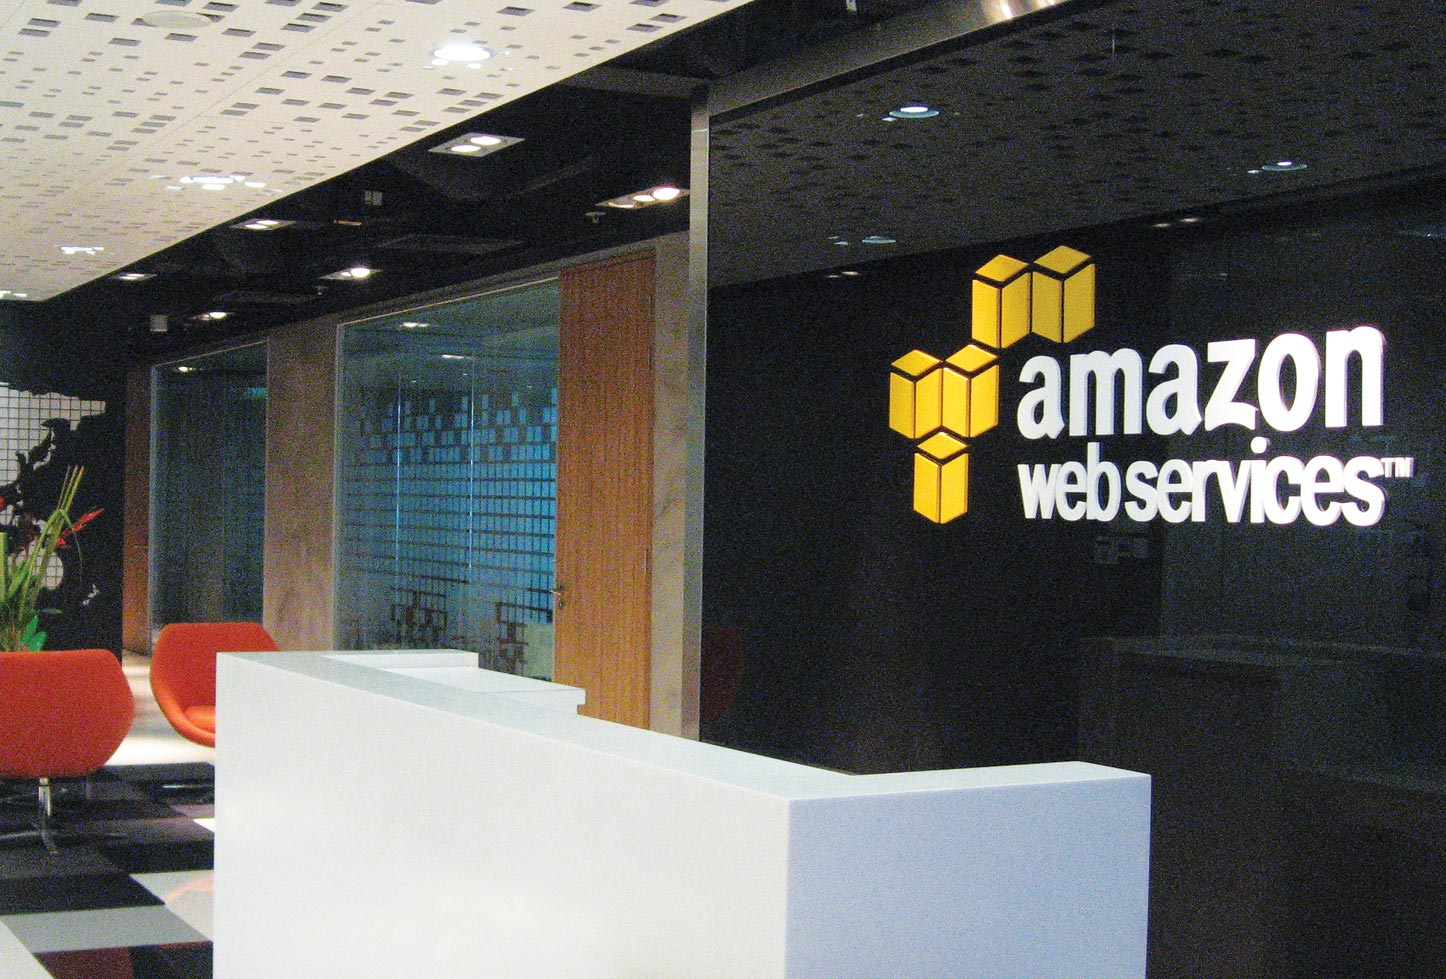 amazon-web-services.jpg